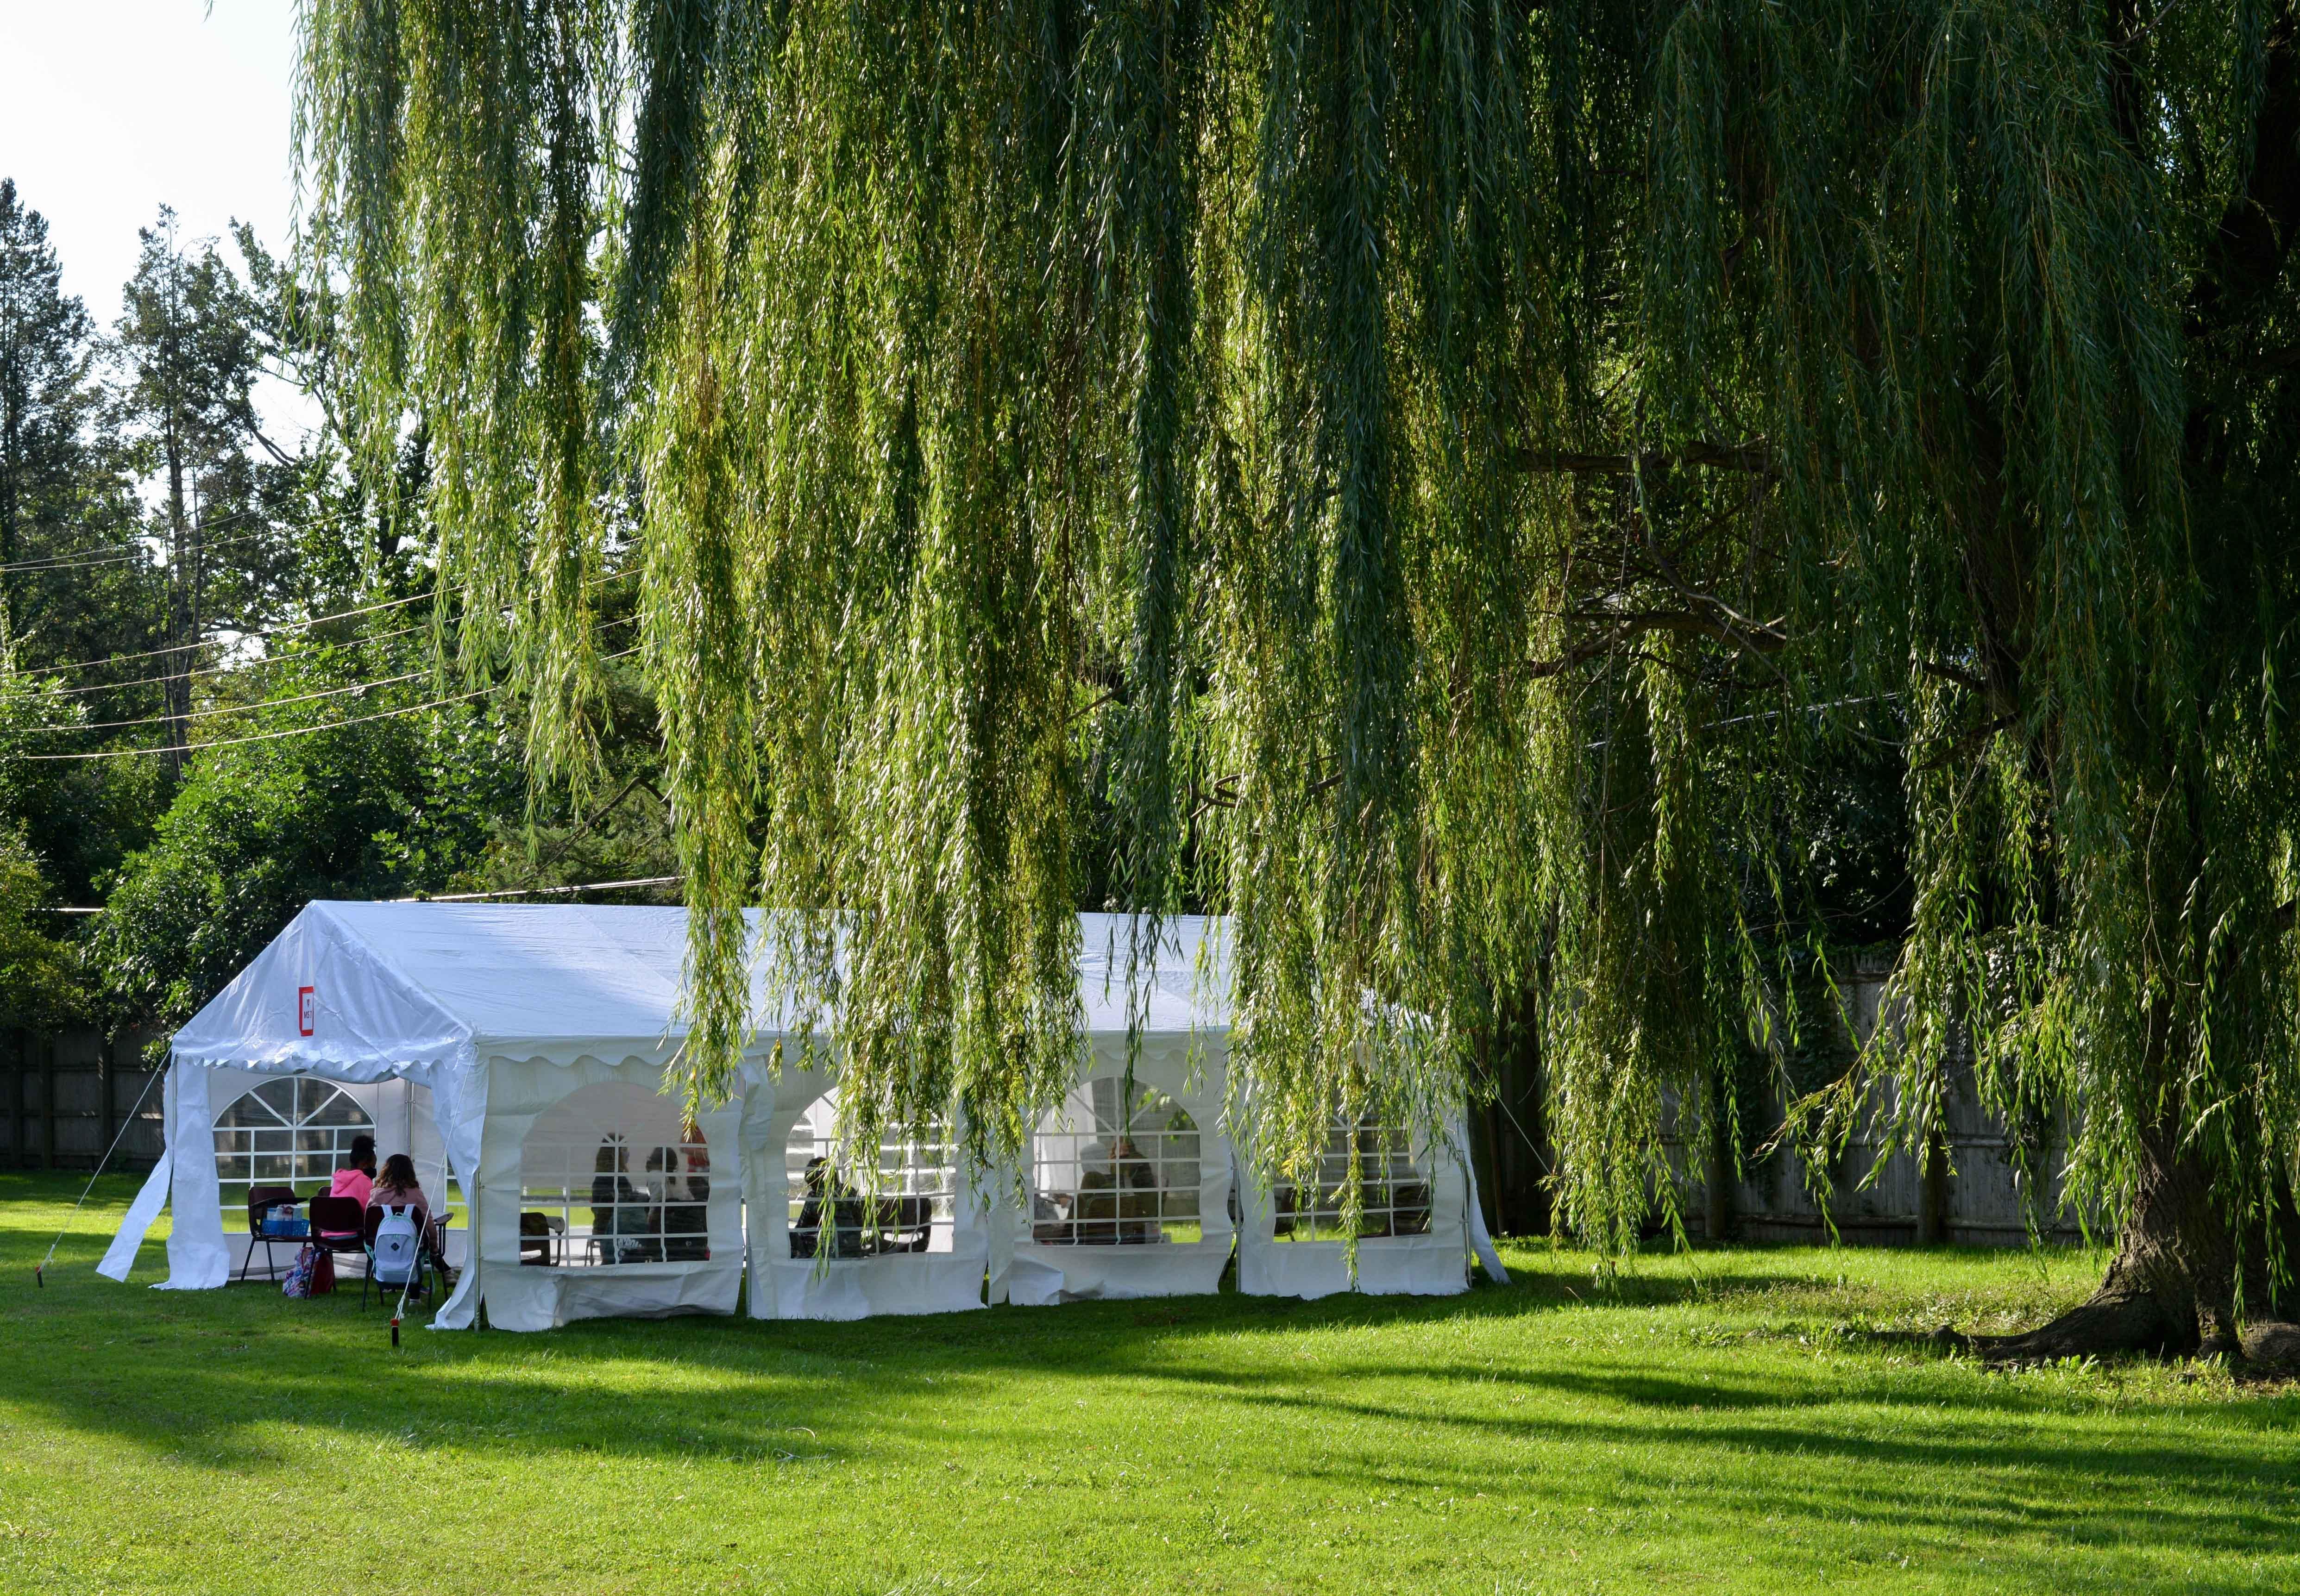 Willow tree tent